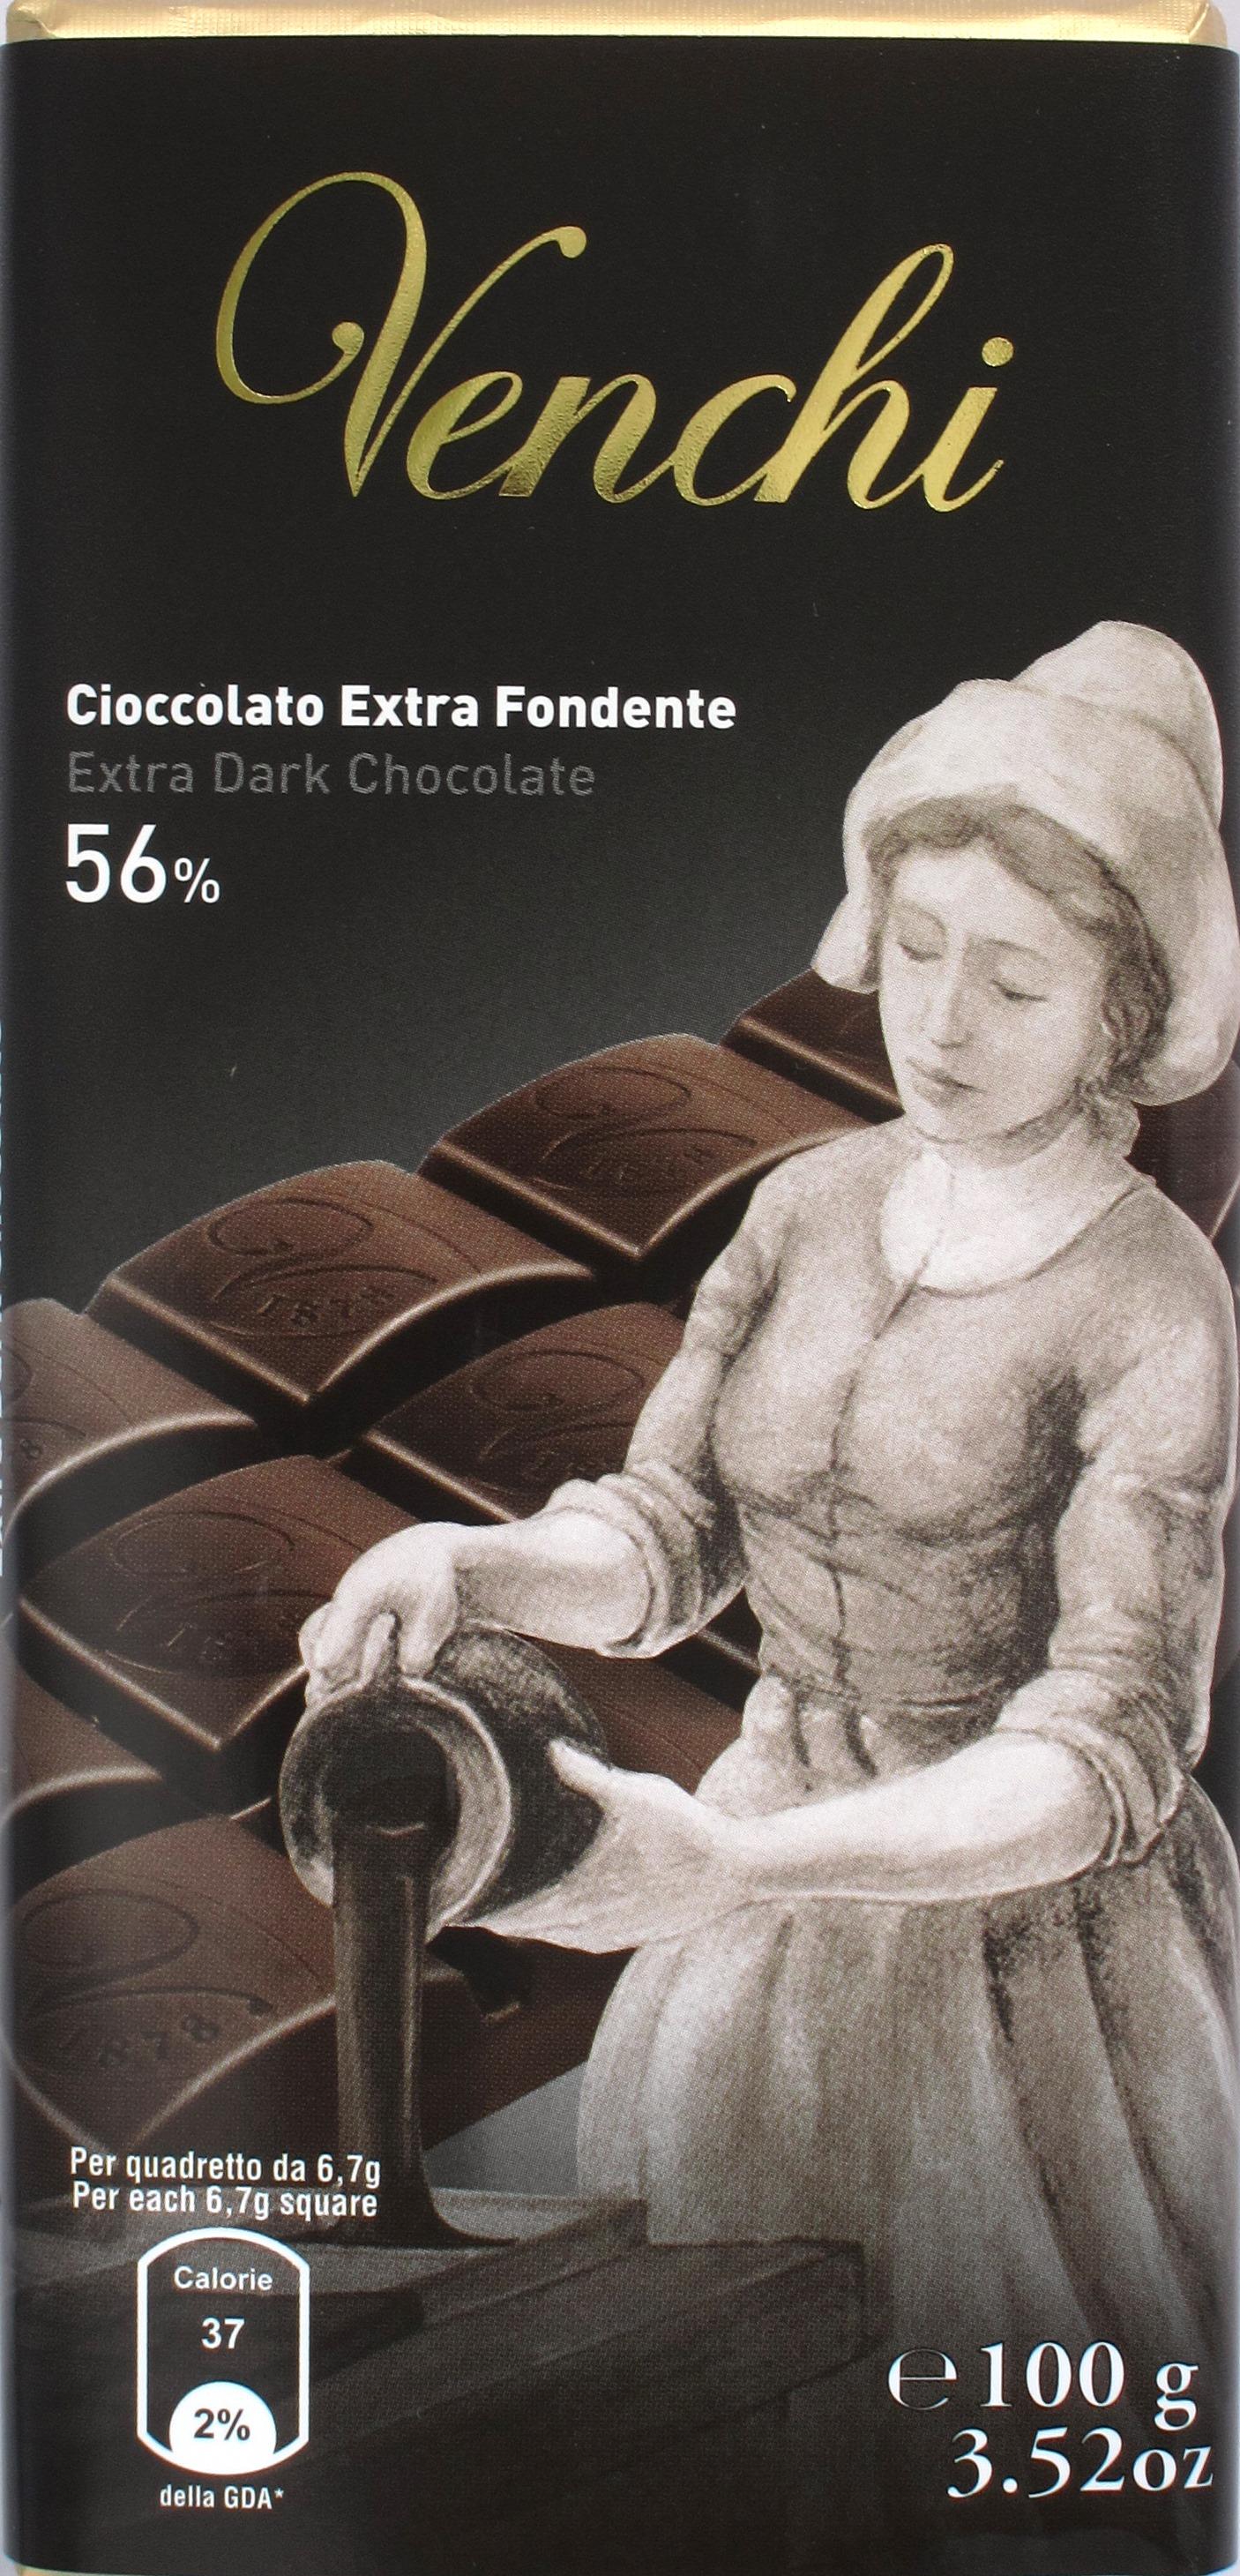 Venchi Bitterschokolade 56% Fondente